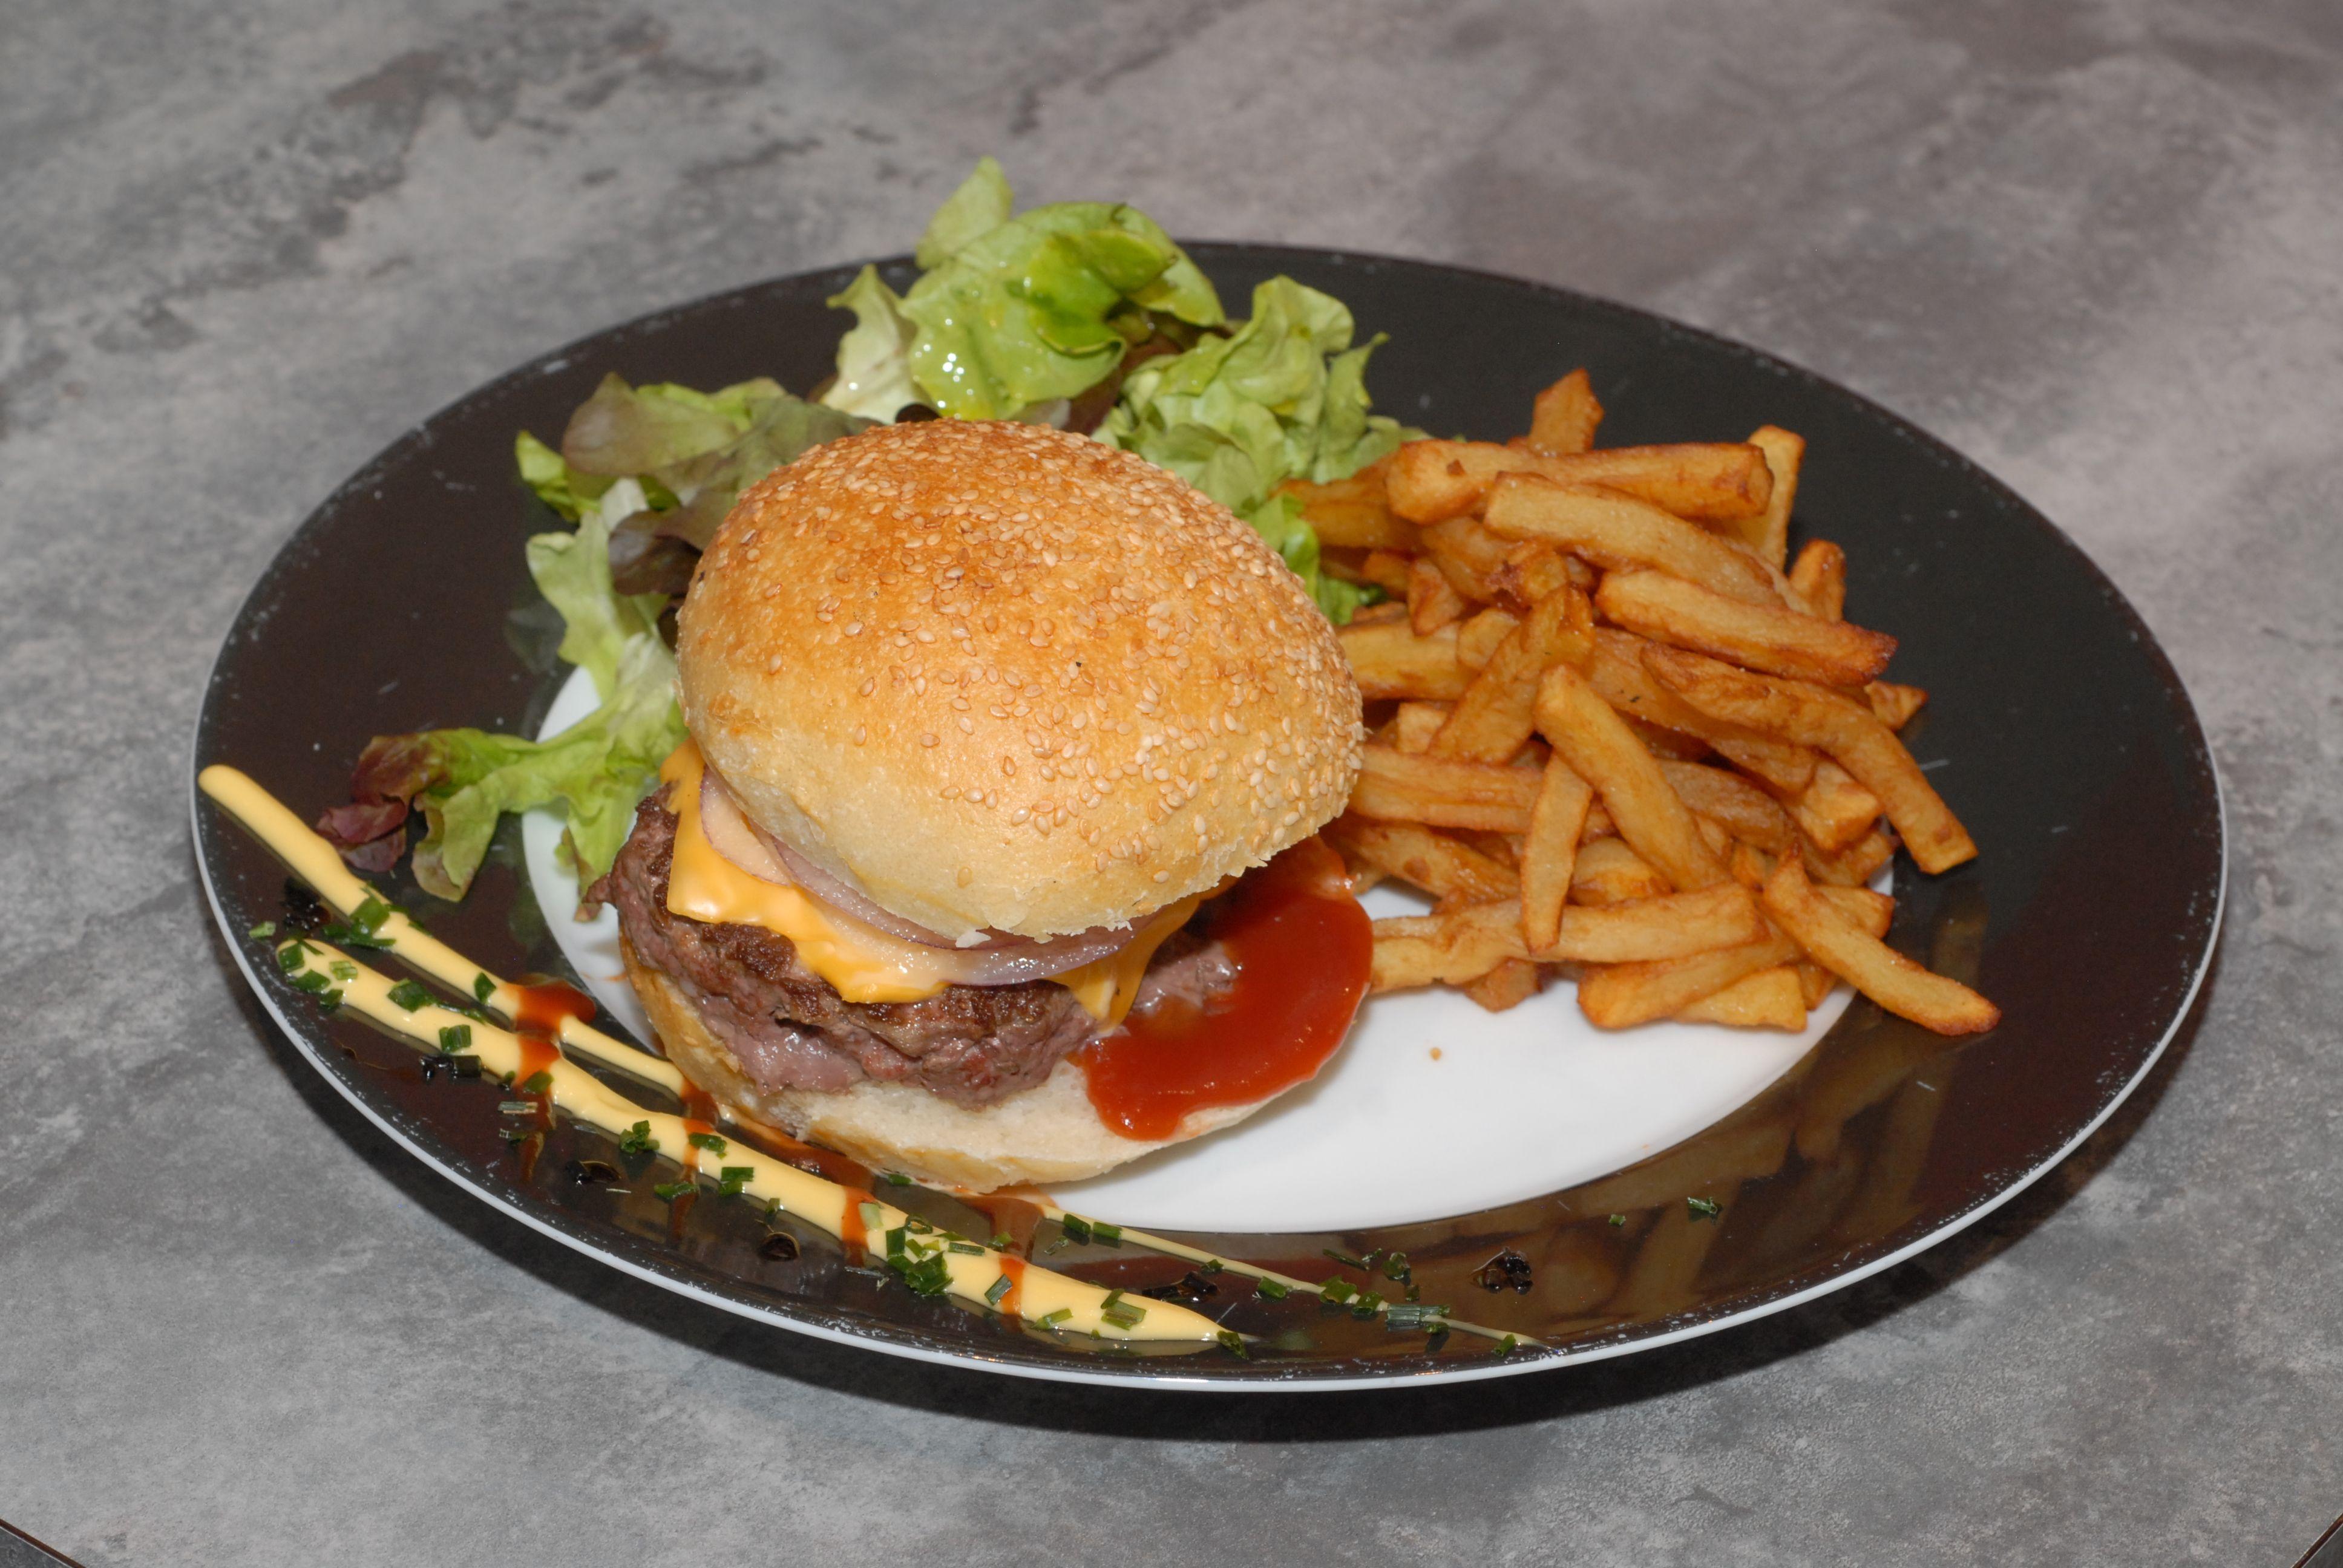 restaurant-pizzeria-echirolles-hamburger-frites